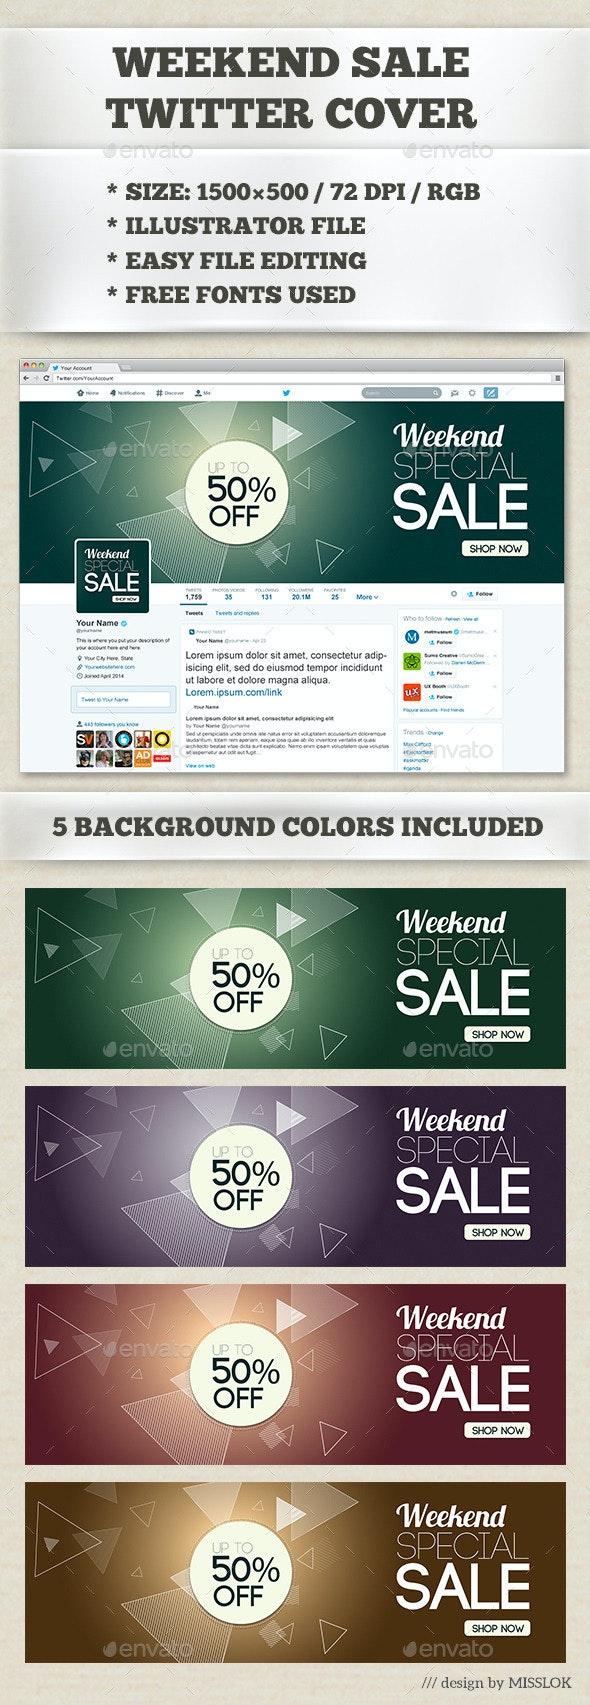 Weekend Sale Twitter Cover - Twitter Social Media